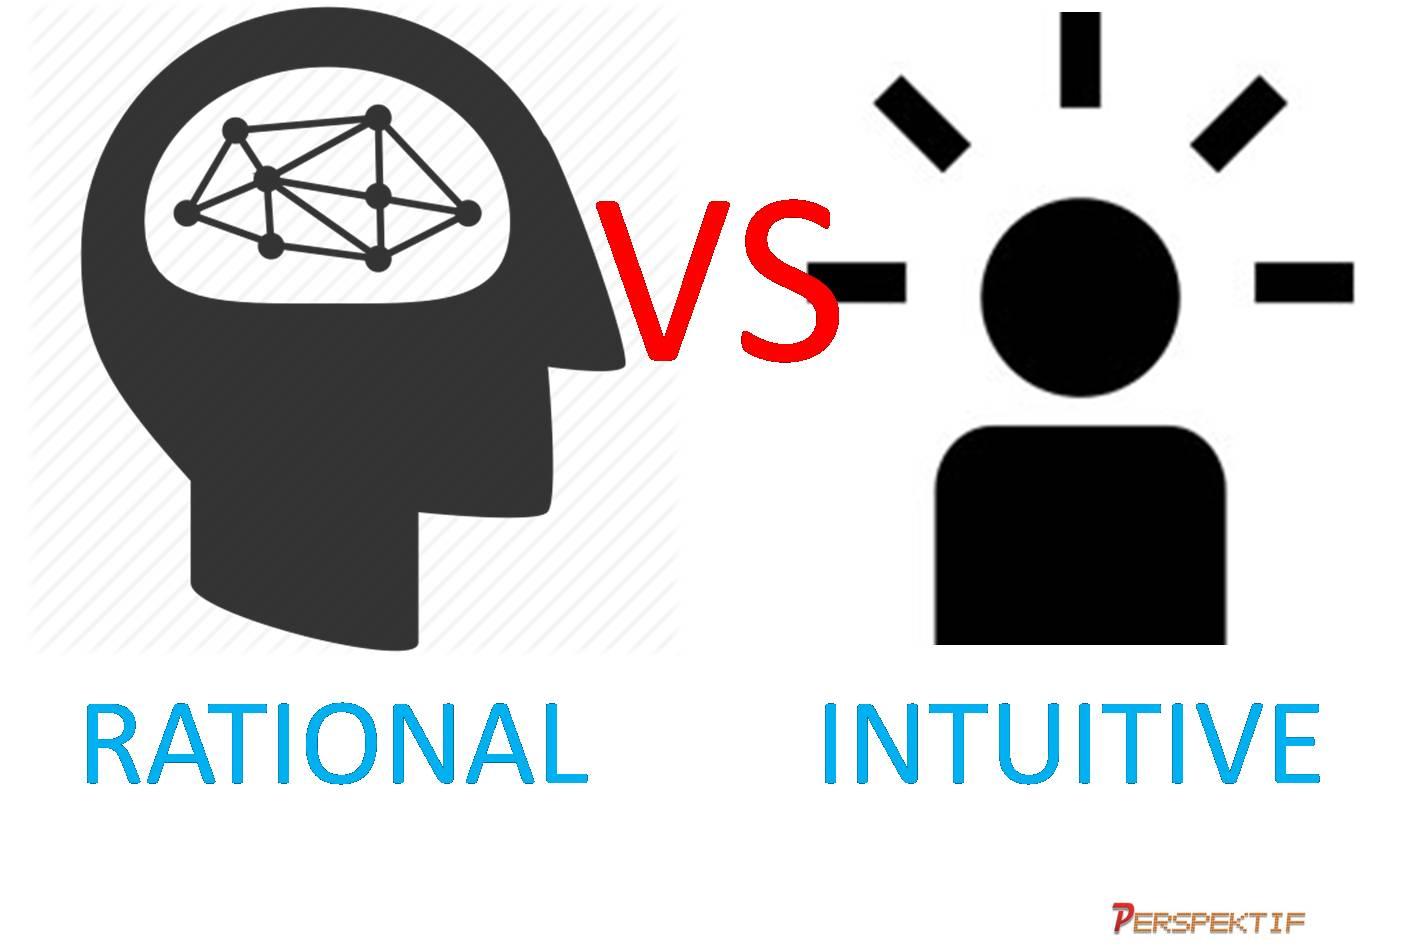 Pengambilan Keputusan Secara Rasional V Intuitif Perspektif